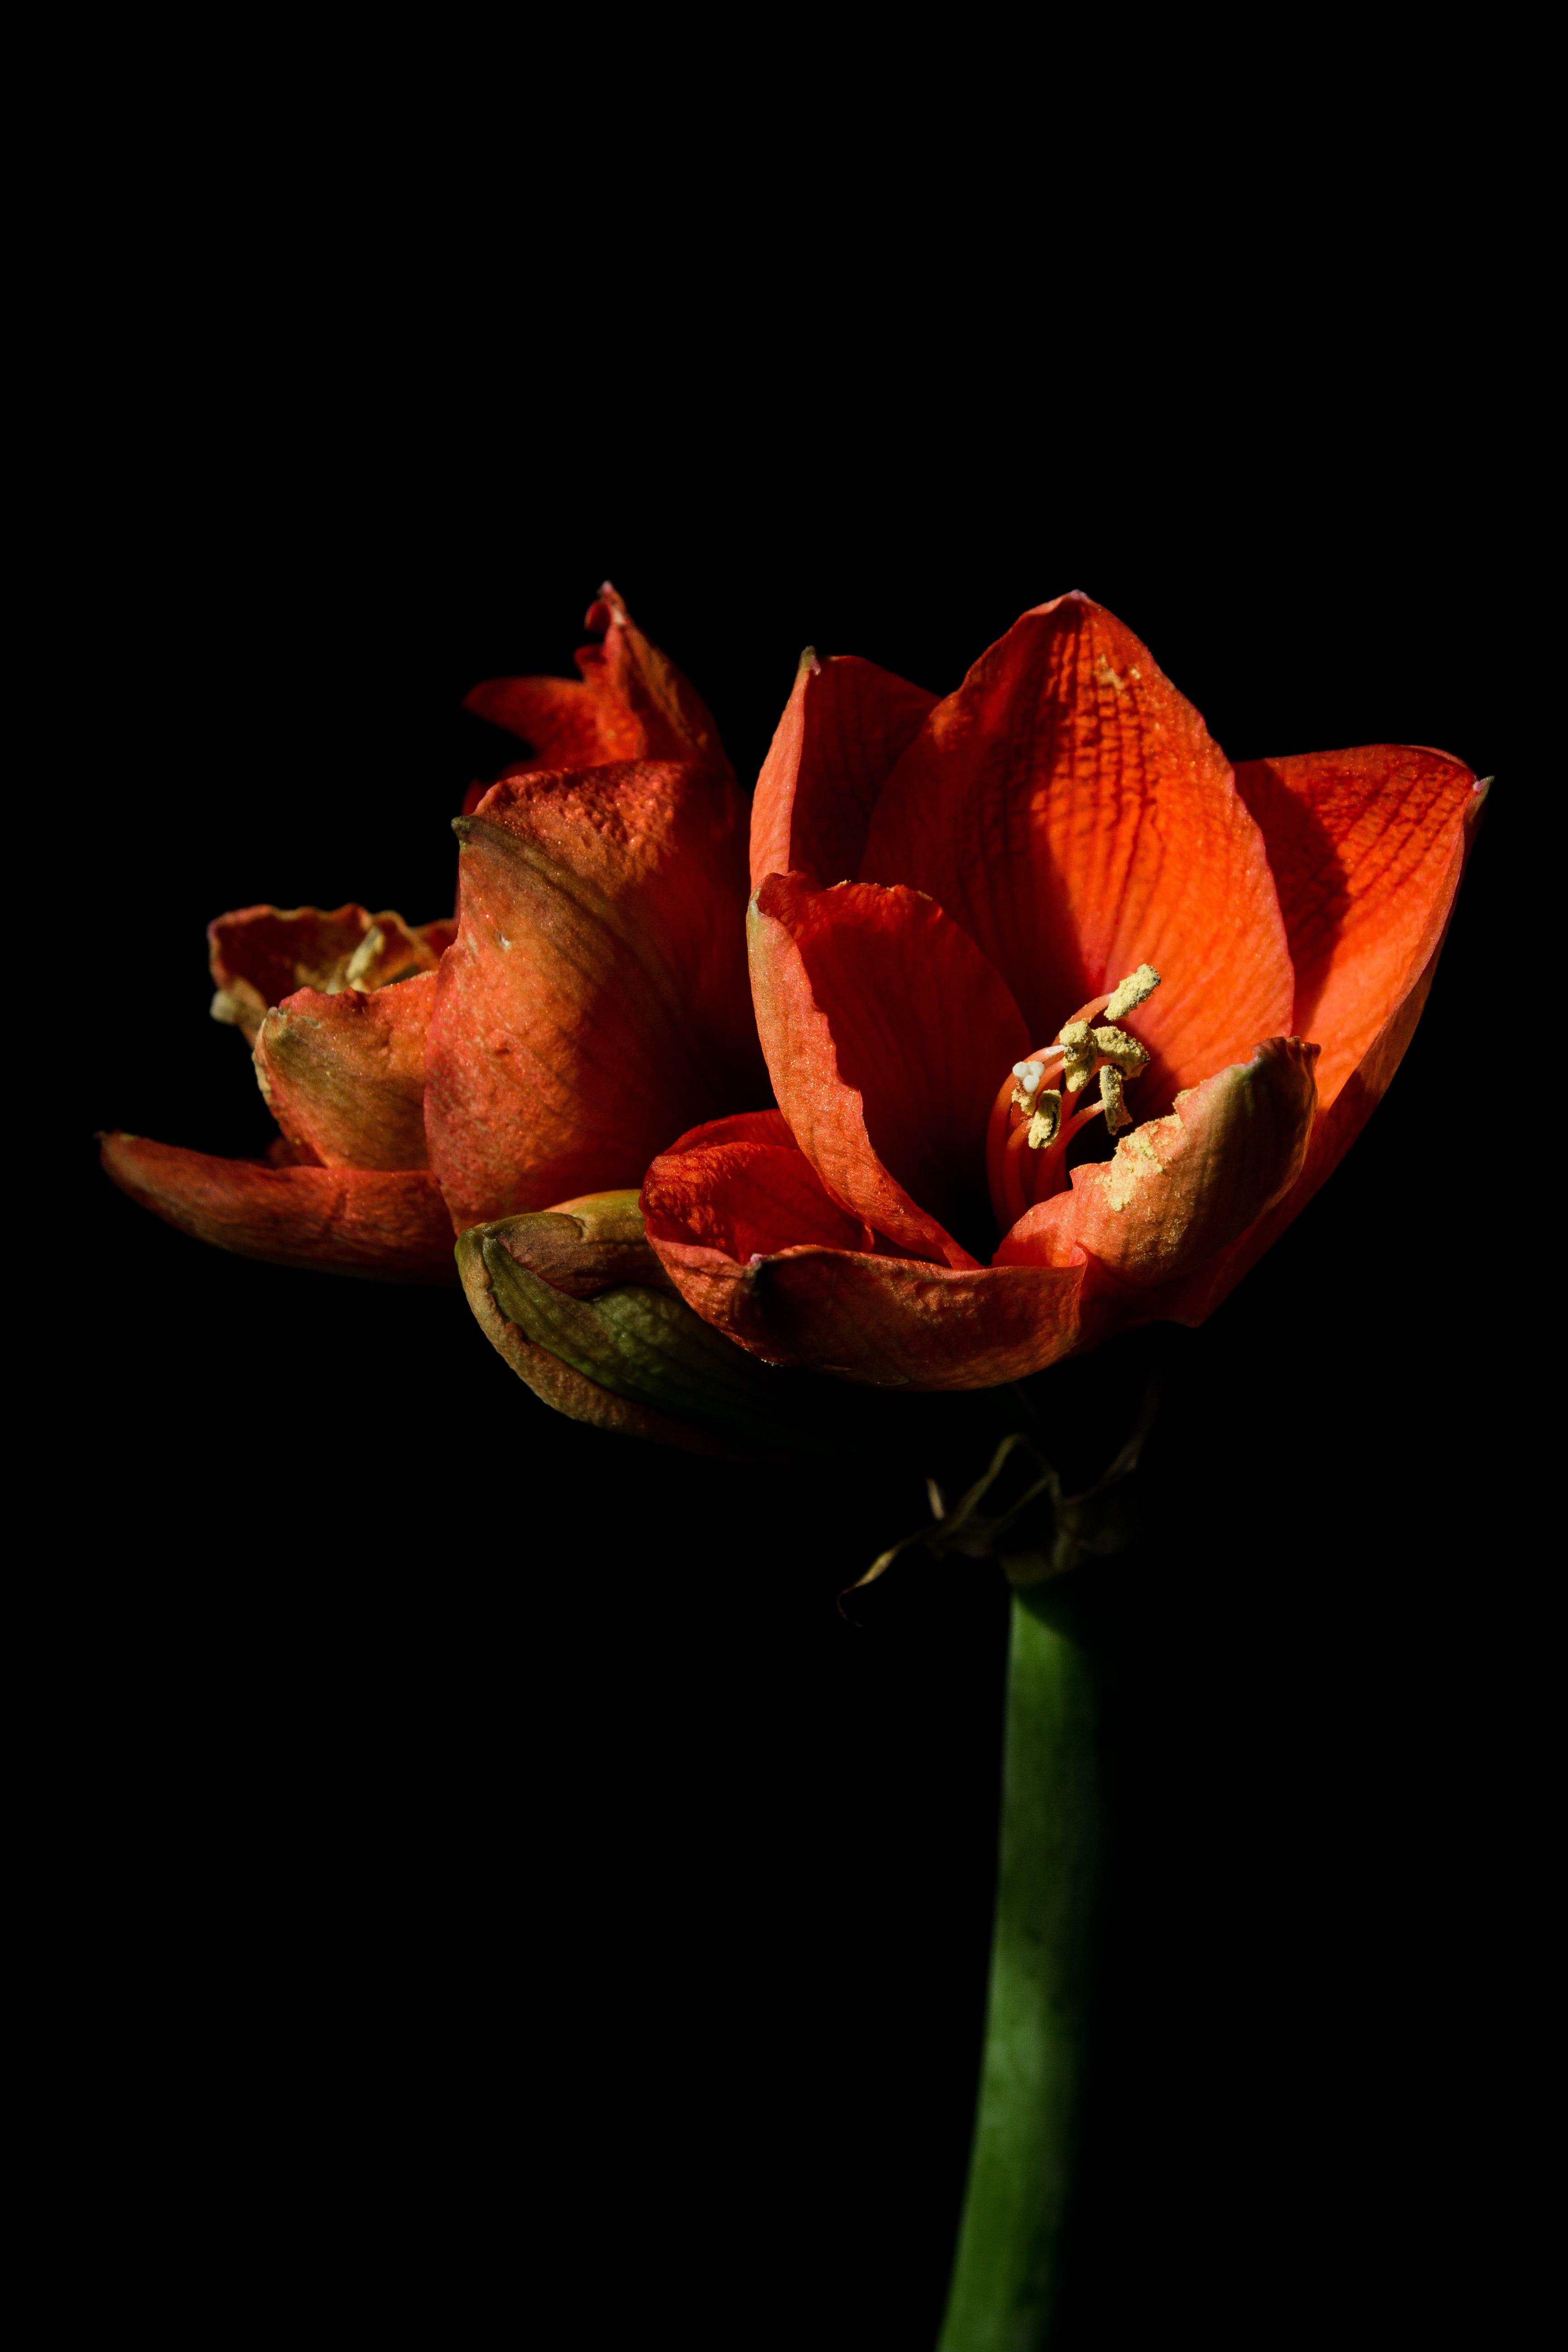 Free stock photo of amaryllis, flowers on black, minimalistic, red flower